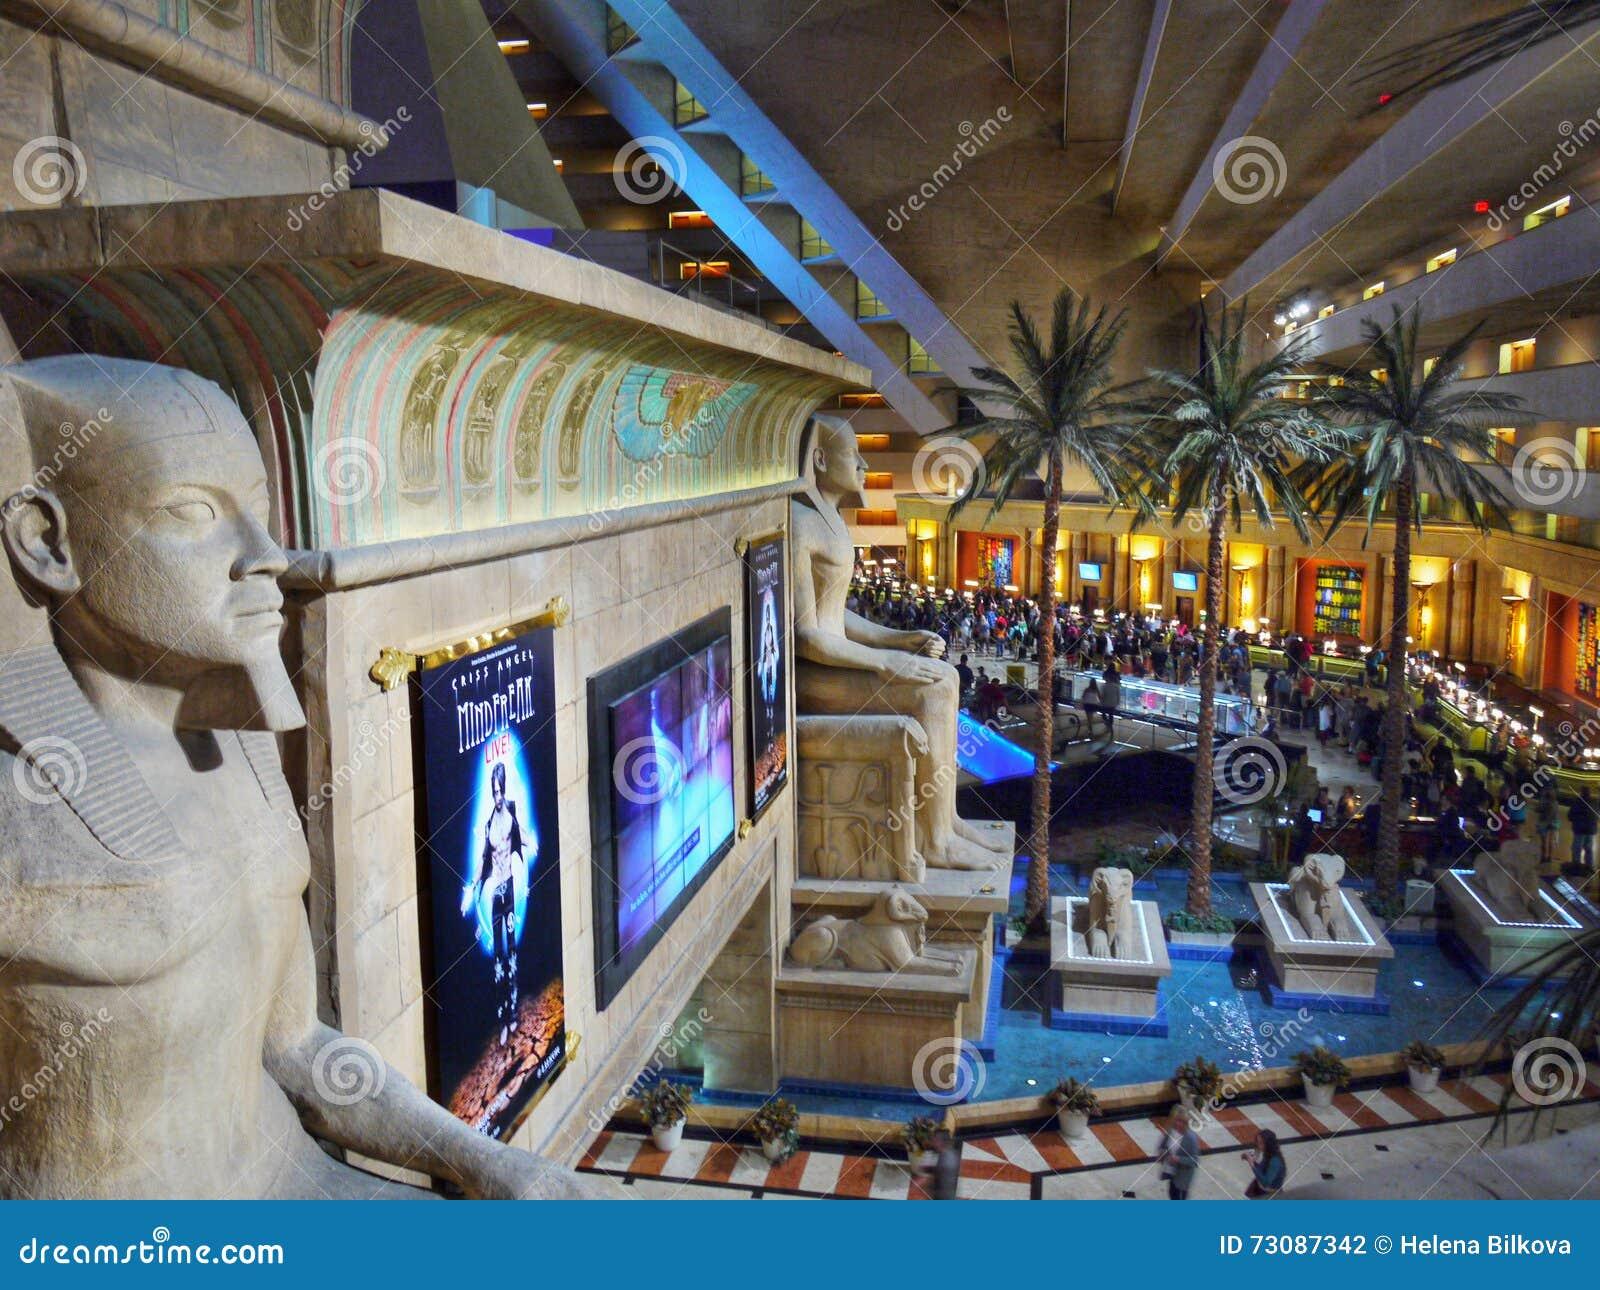 Luxor Casino Interior Lobby Las Vegas Editorial Photography - Image of hall, gambling: 73087342